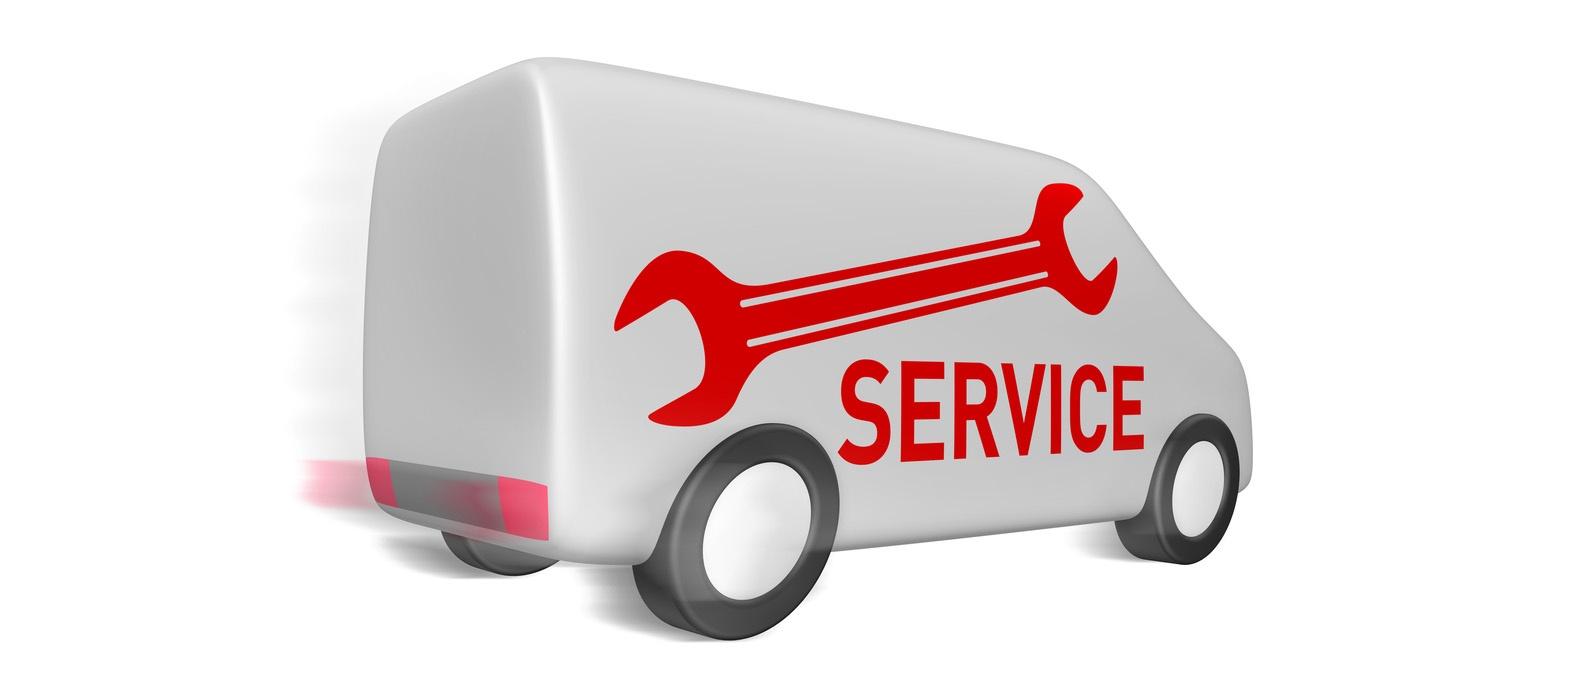 servicew-truck-blog.jpg